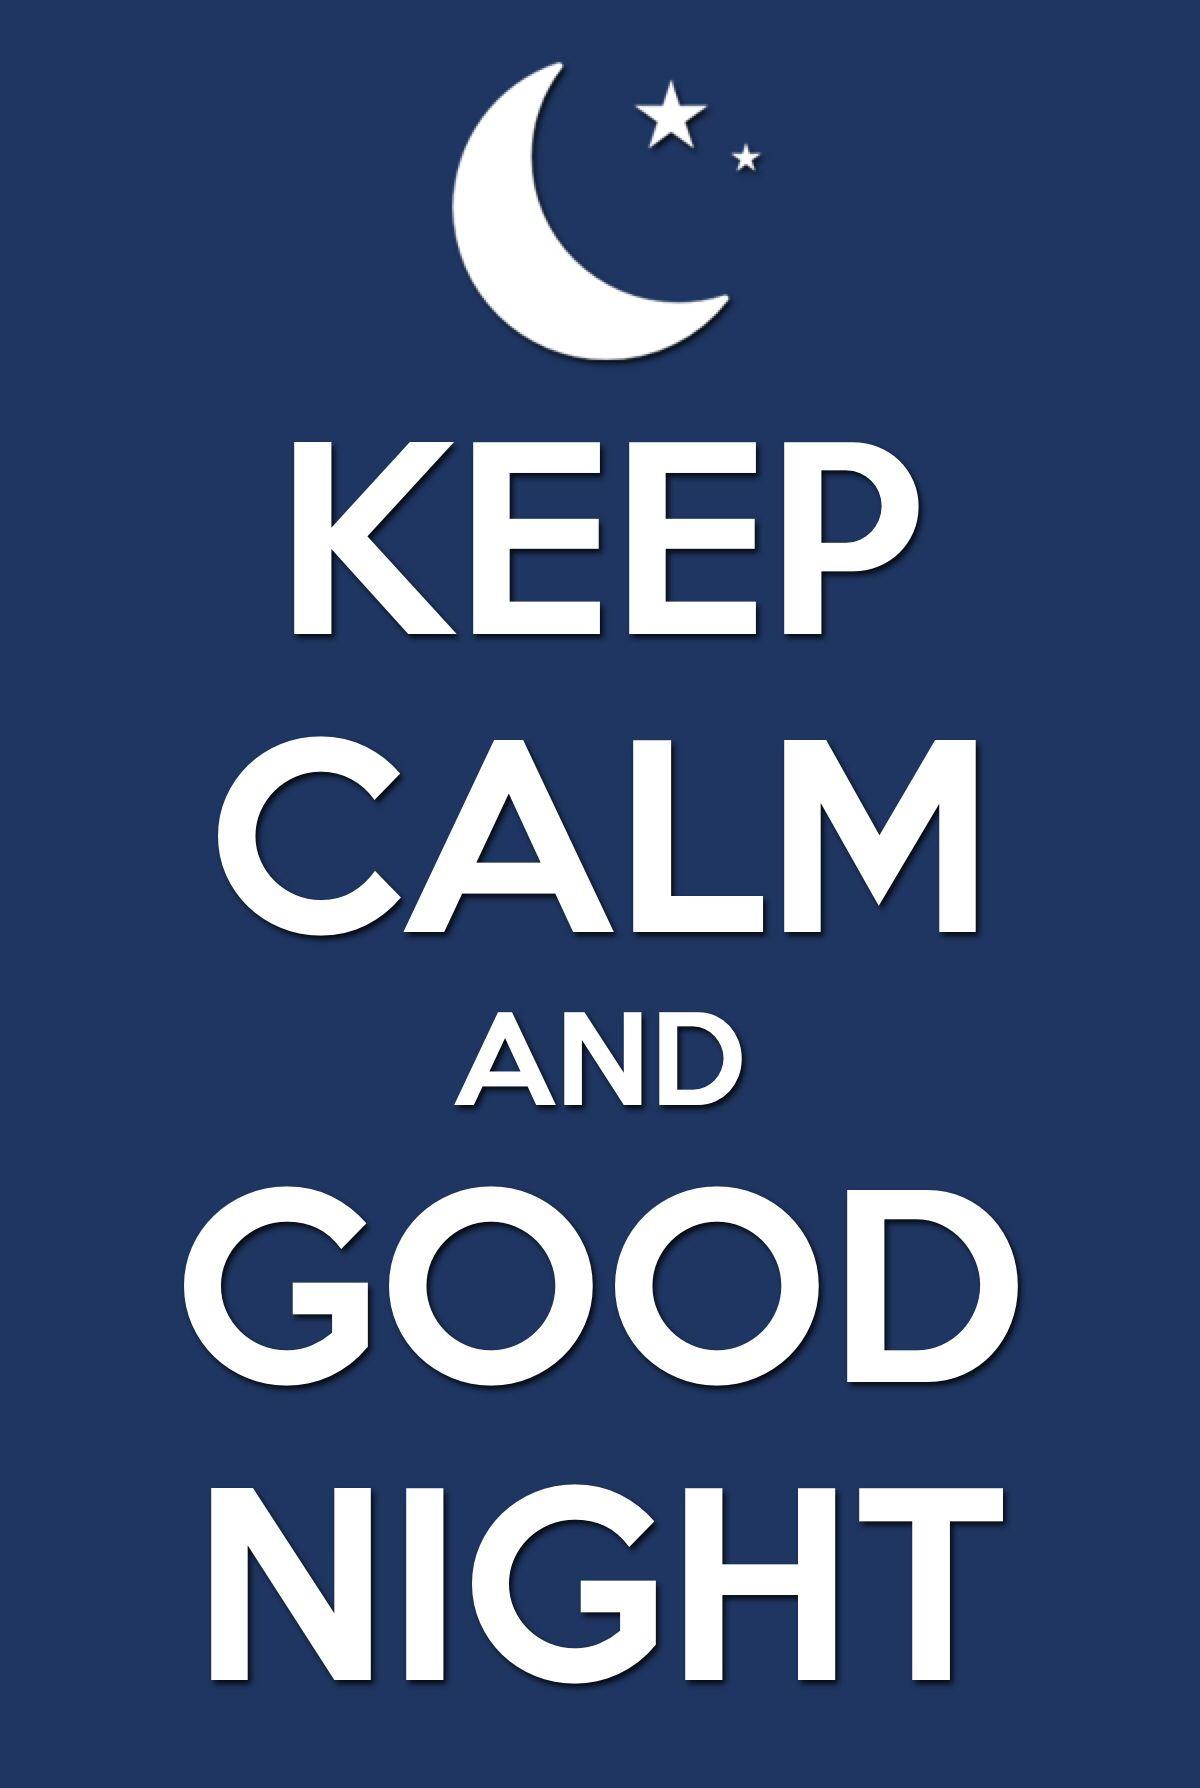 Goodnight keep calm football love person